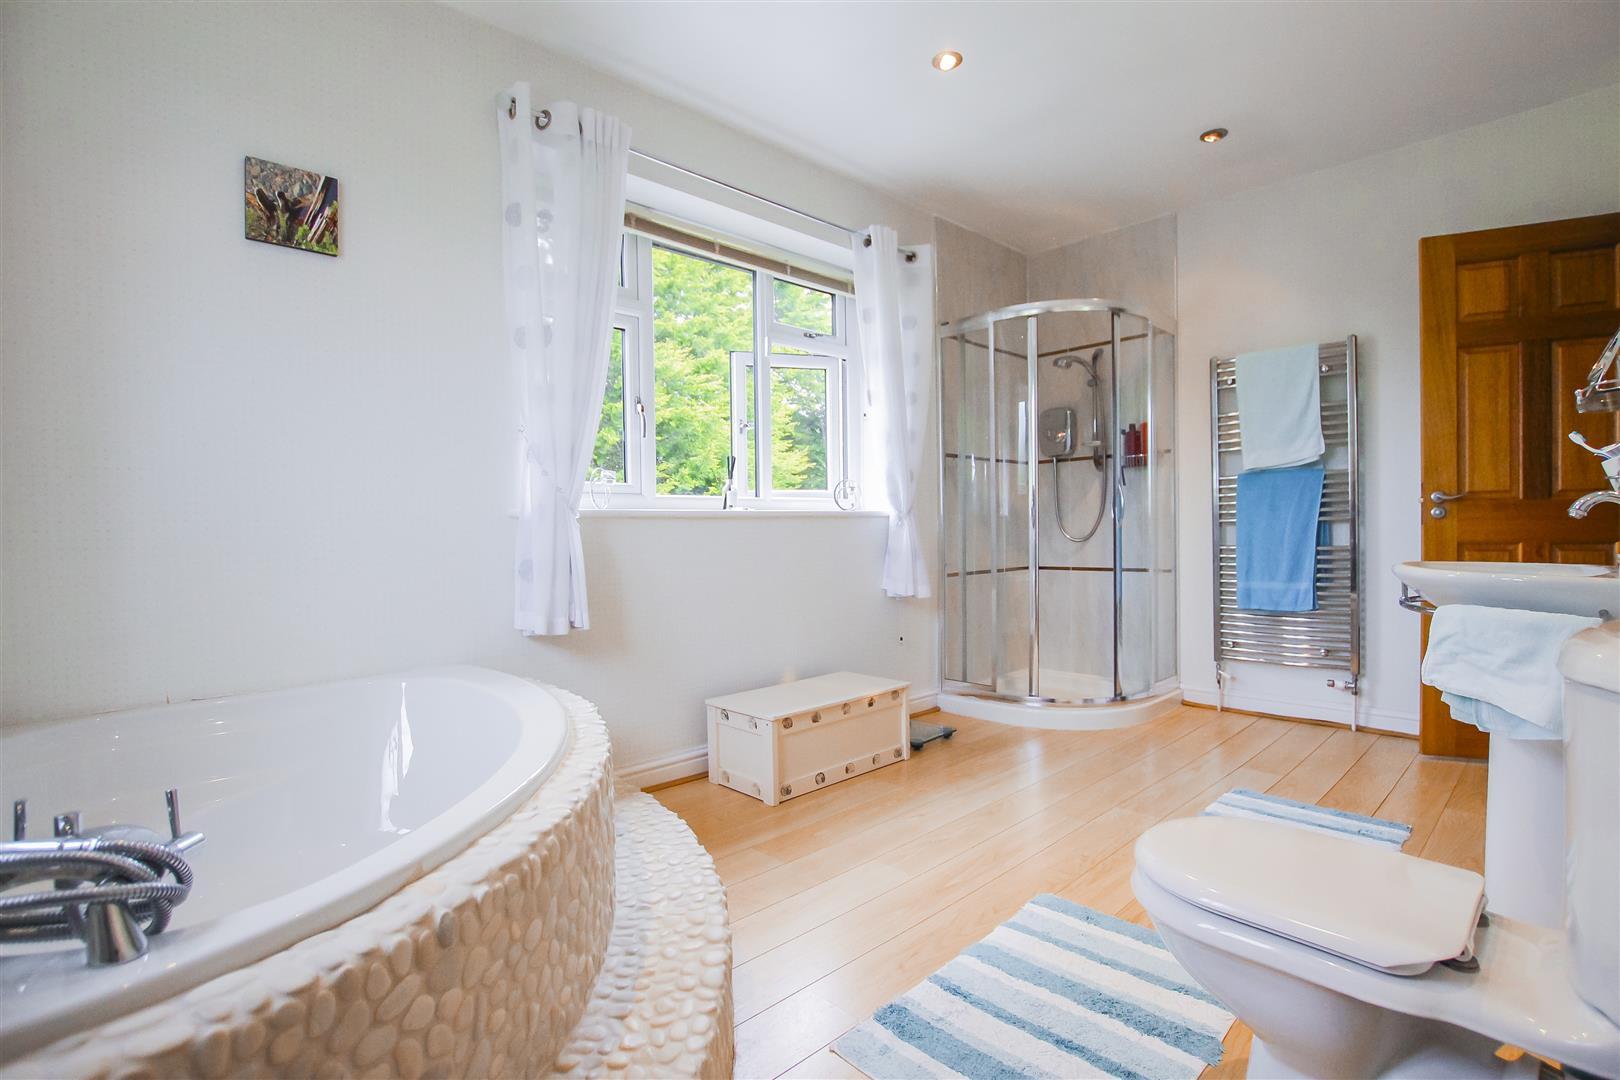 6 Bedroom Detached House For Sale - Annex Bathroom